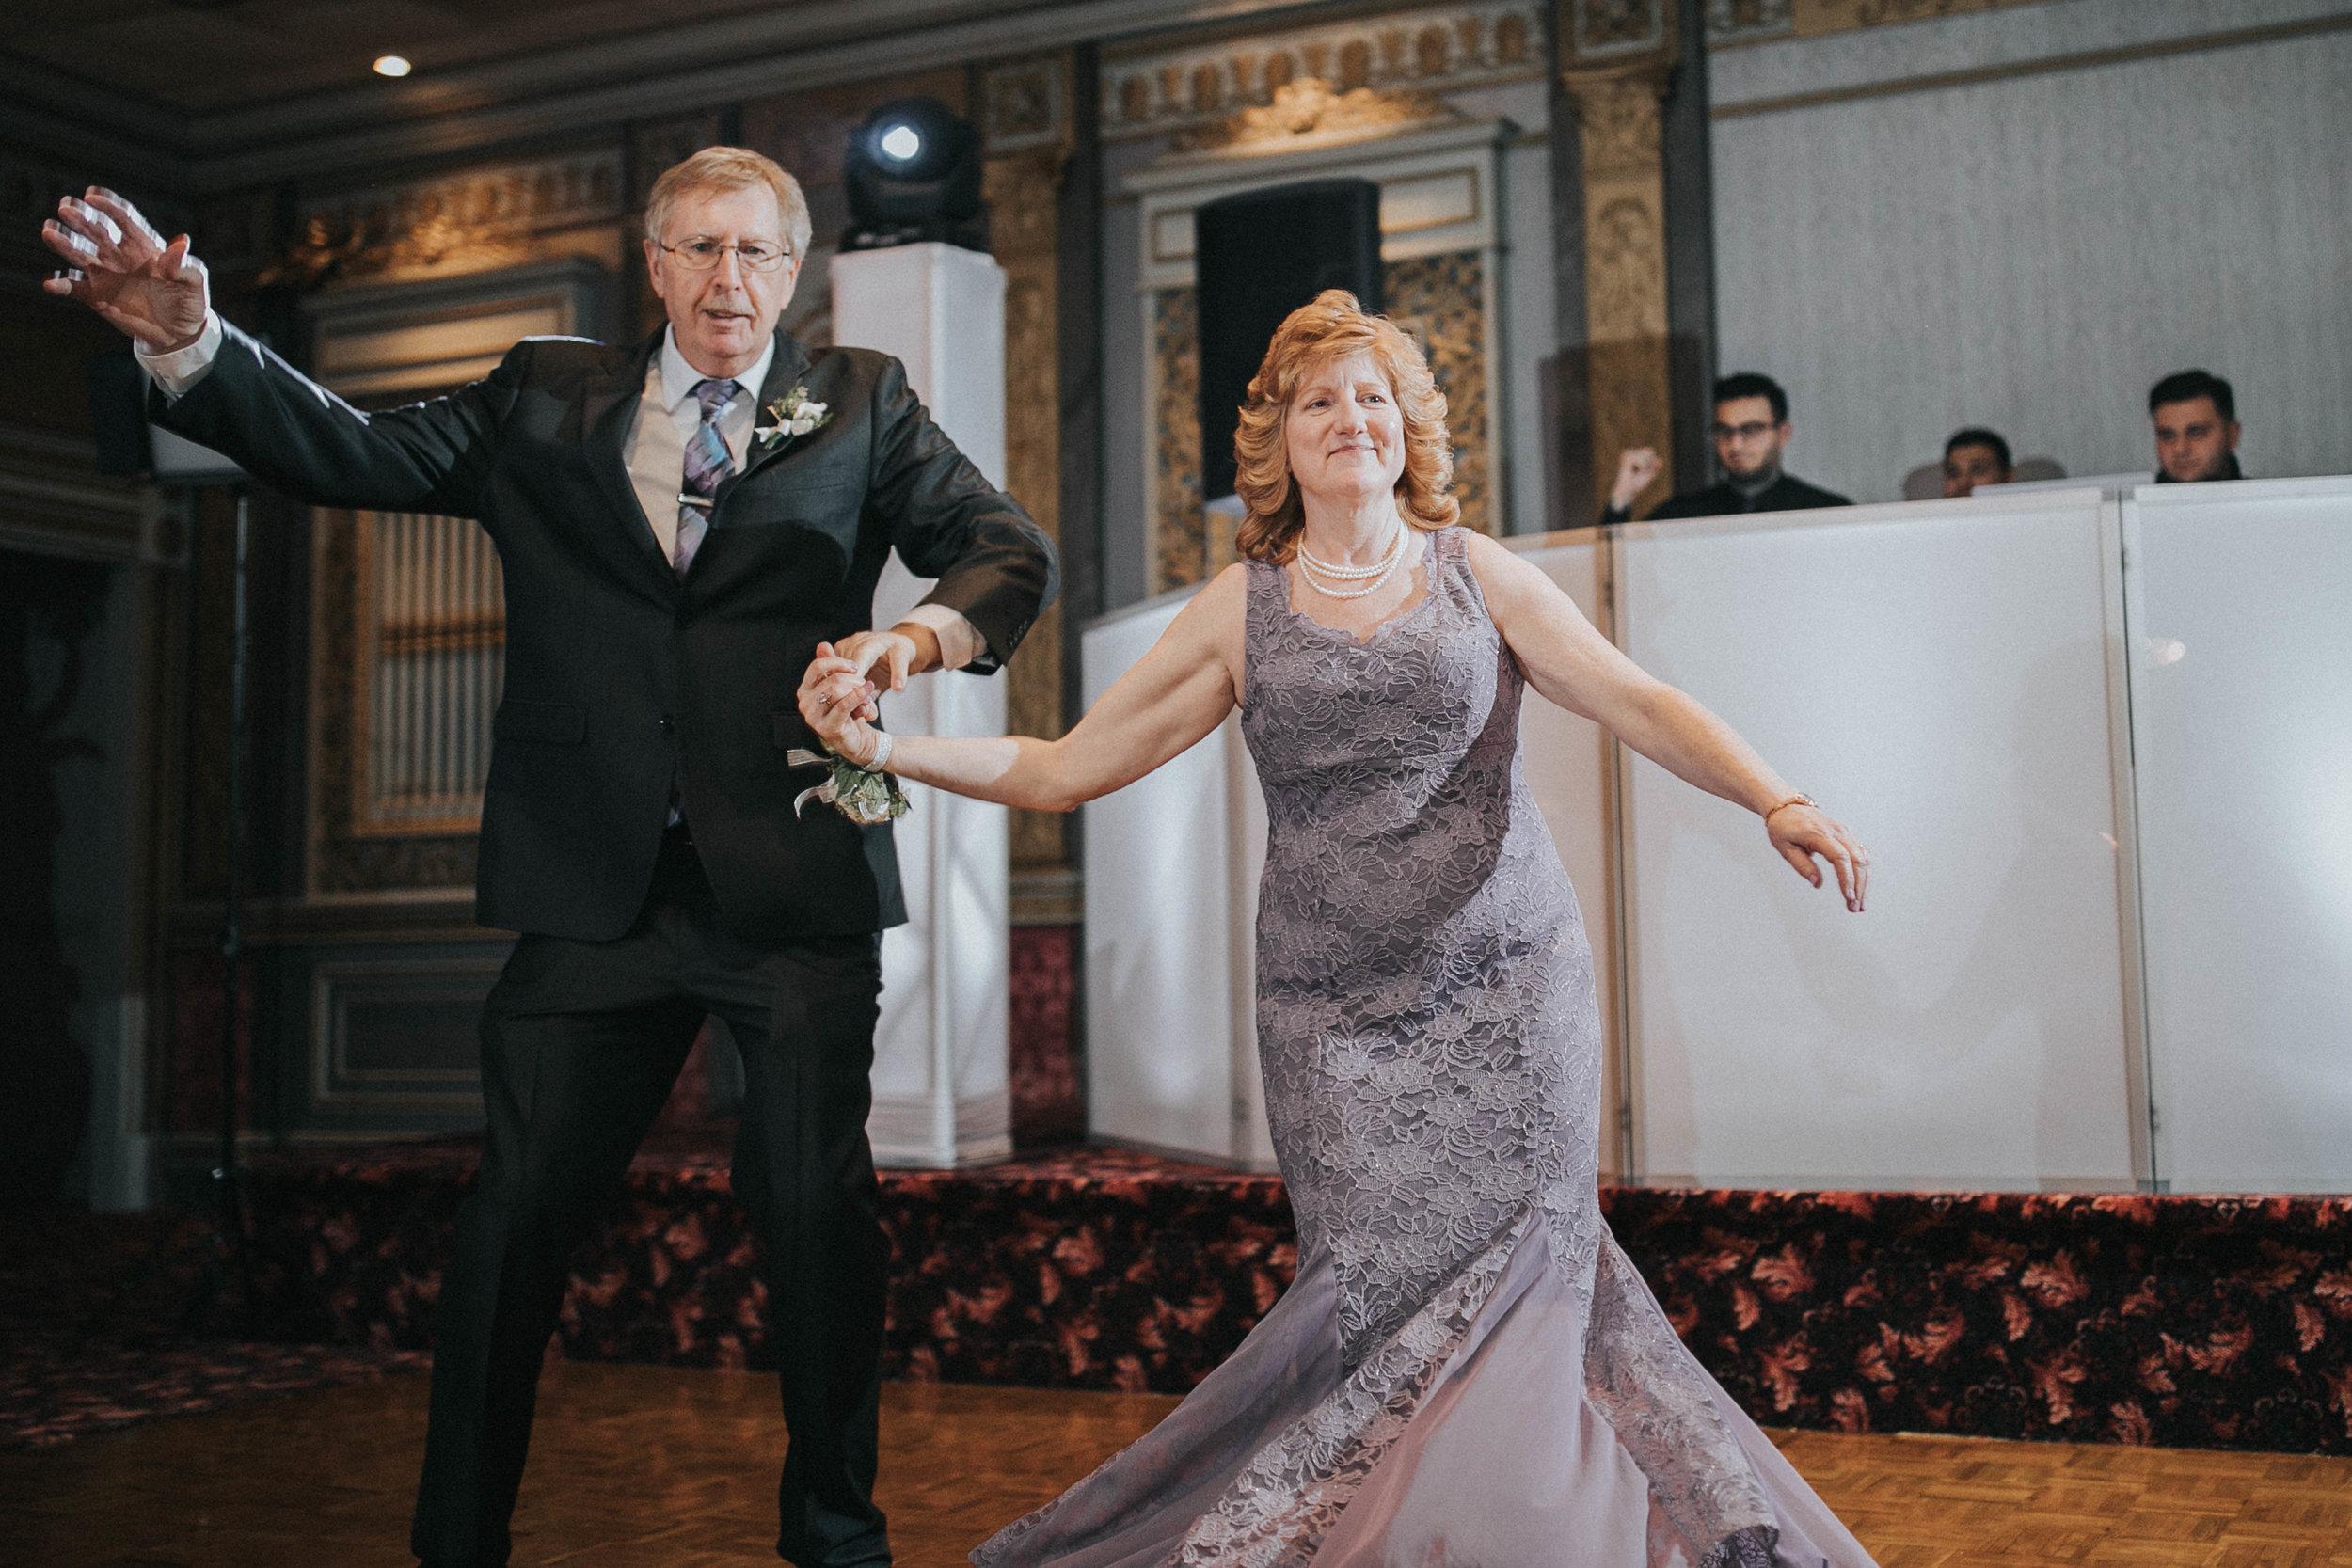 New-Jersey-Wedding-Photography-Fishers-Tudor-House-JennaLynnPhotography-Reception-Kathleen&Eddie-68.jpg